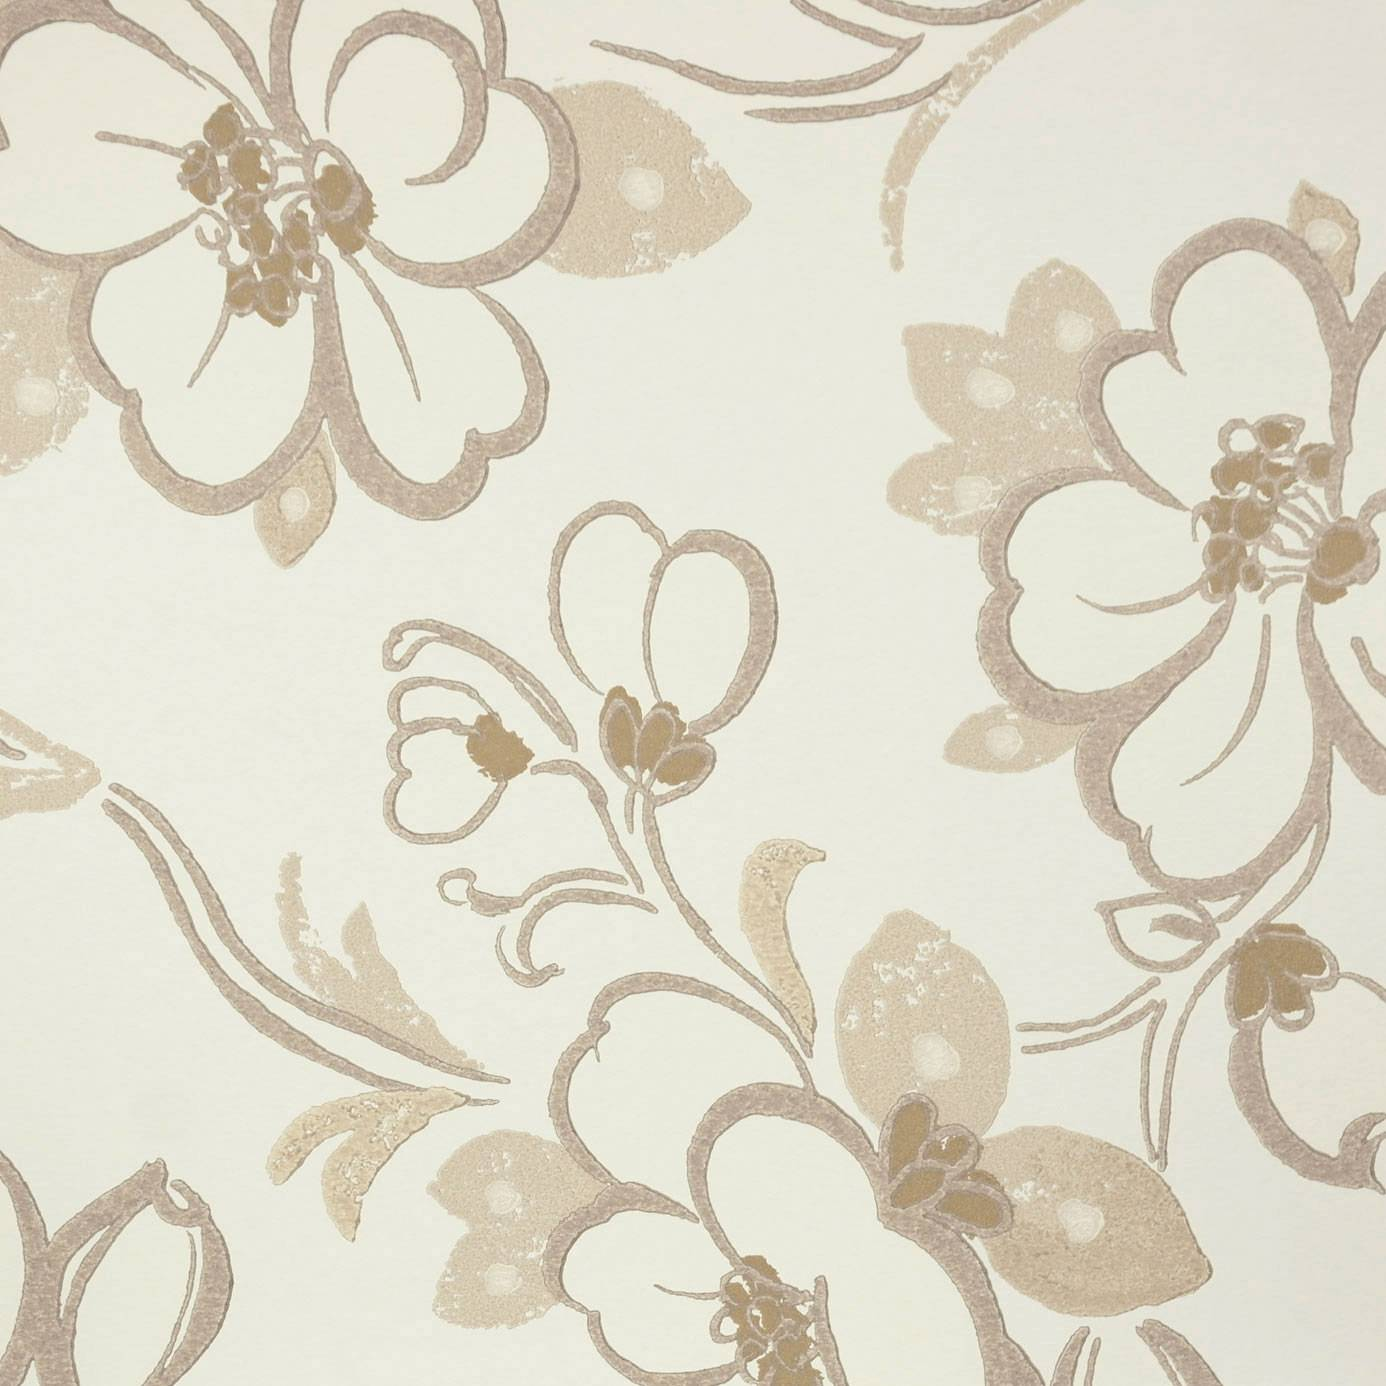 Lotus Flower Wallpaper Oyster P571 01 Designers Guild